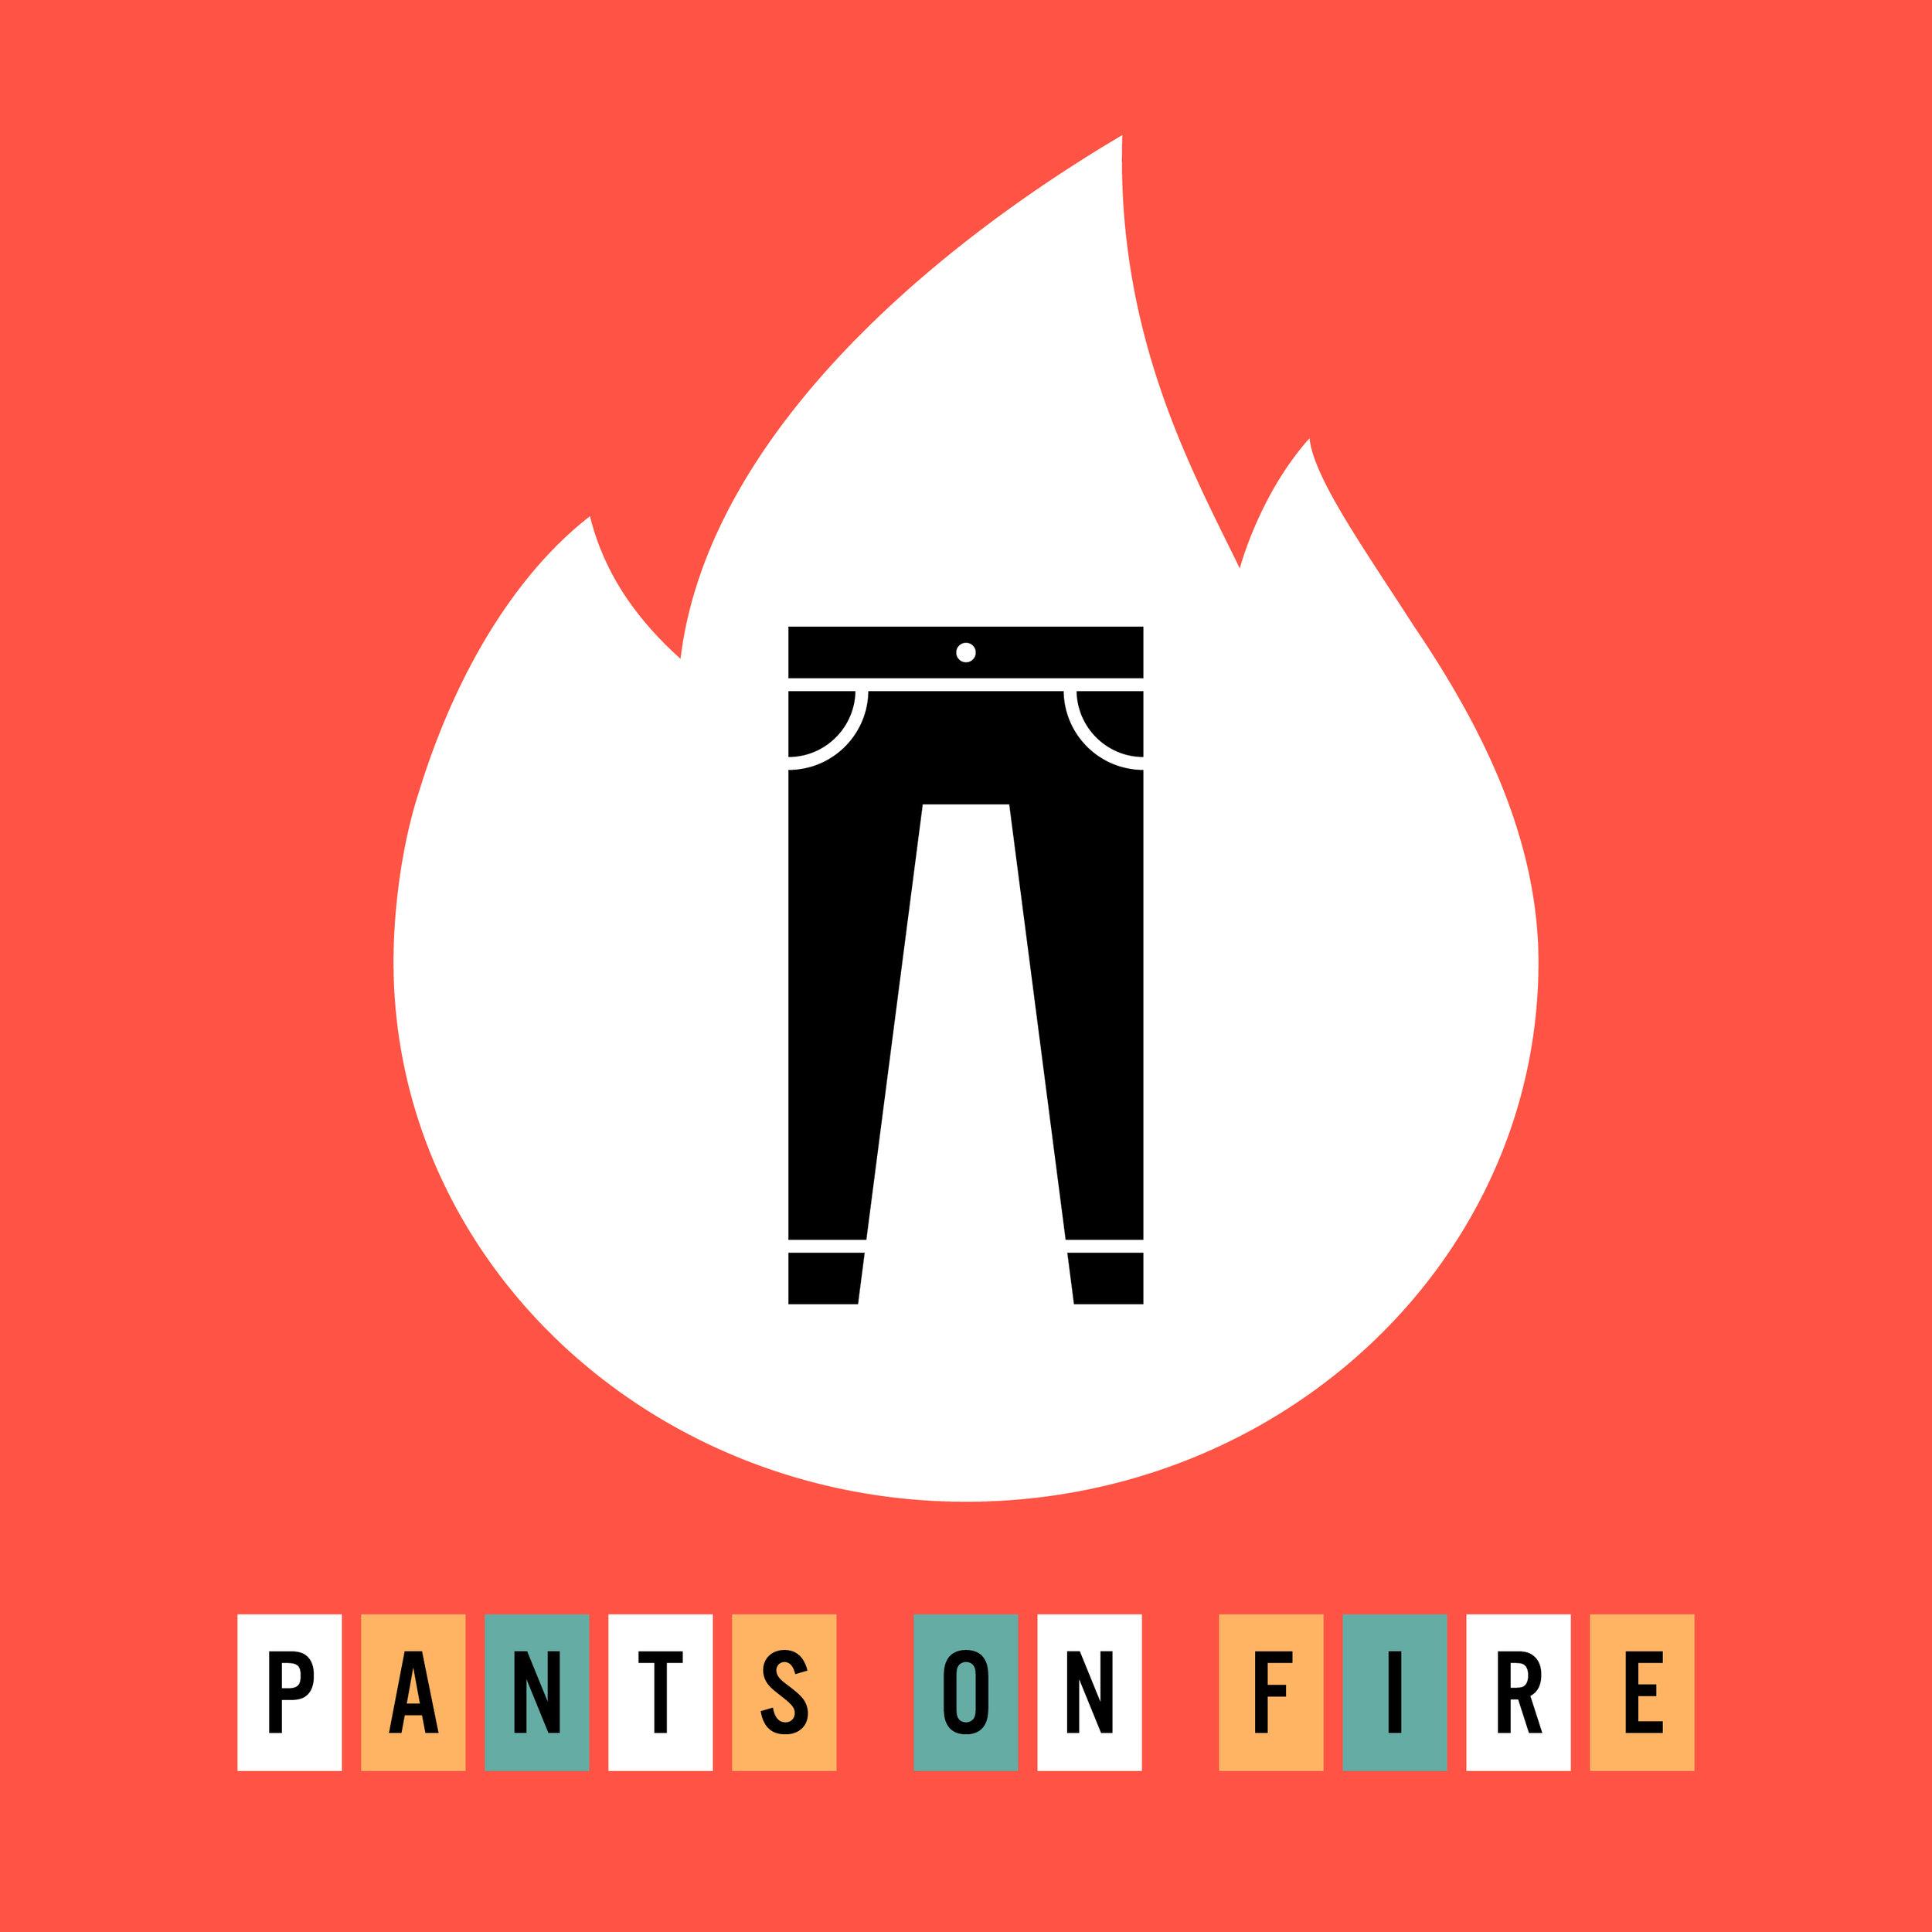 pantsonfire_logo.jpg